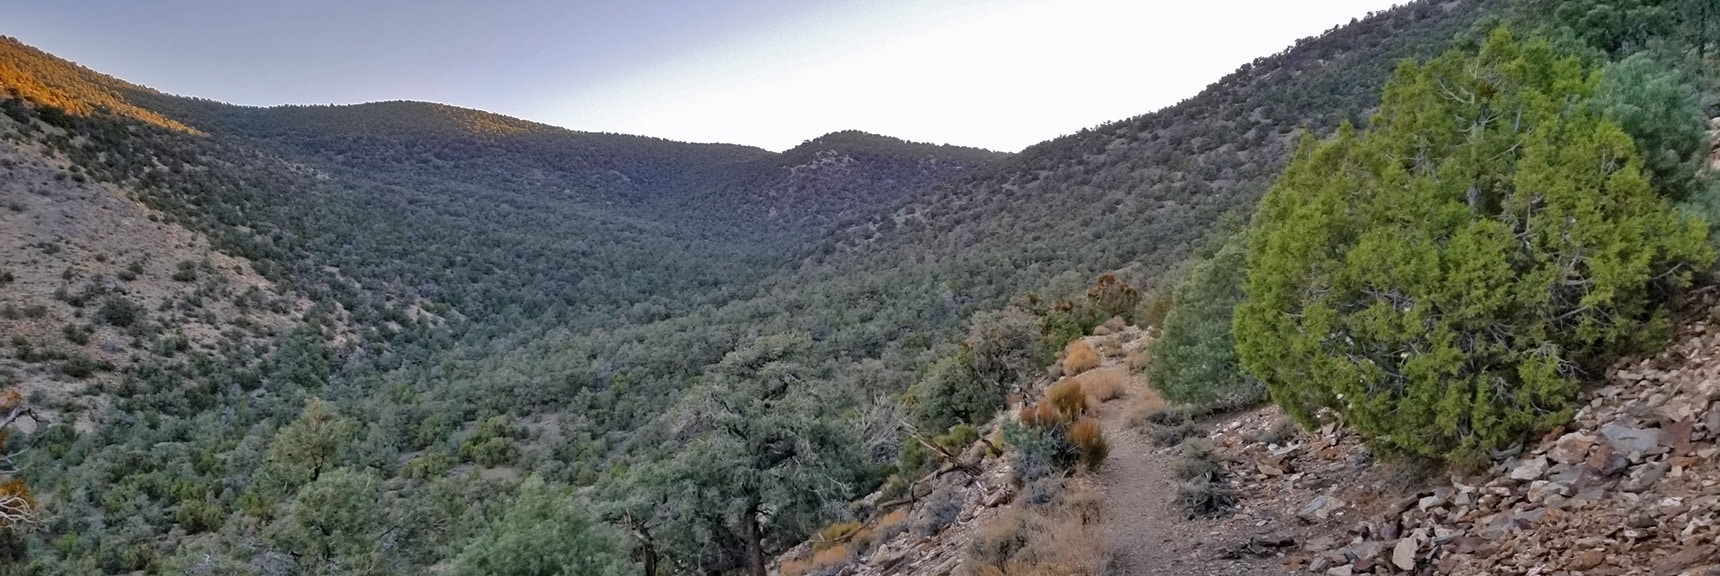 View Up Canyon Trail Approach Toward Panamint Range Summit Ridge   Wildrose Peak   Panamint Mountain Range   Death Valley National Park, California